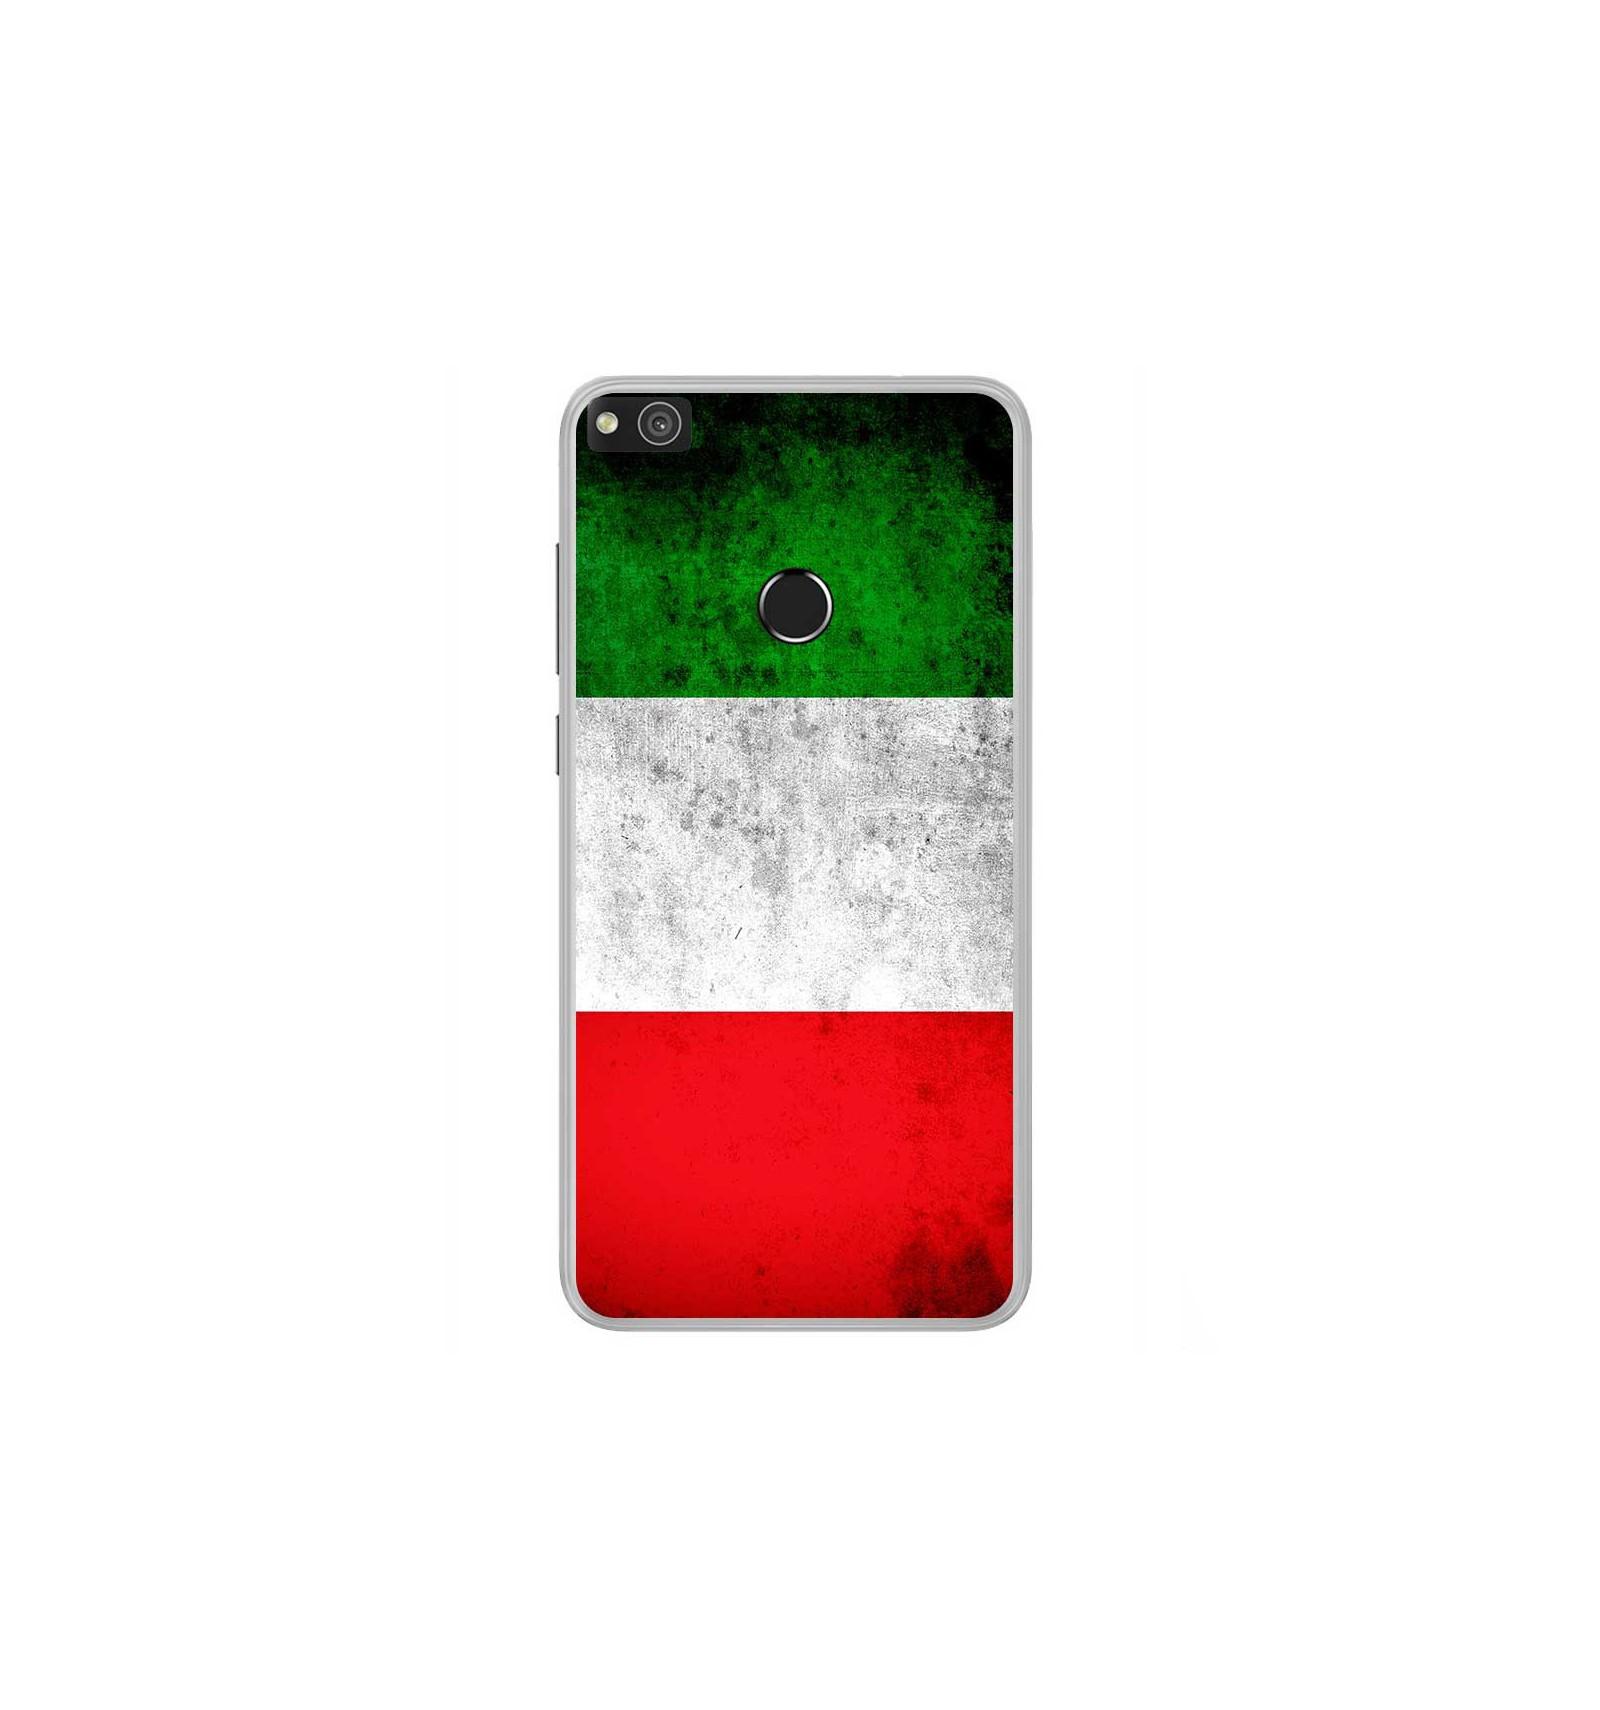 coque huawei p8 lite 2017 italie